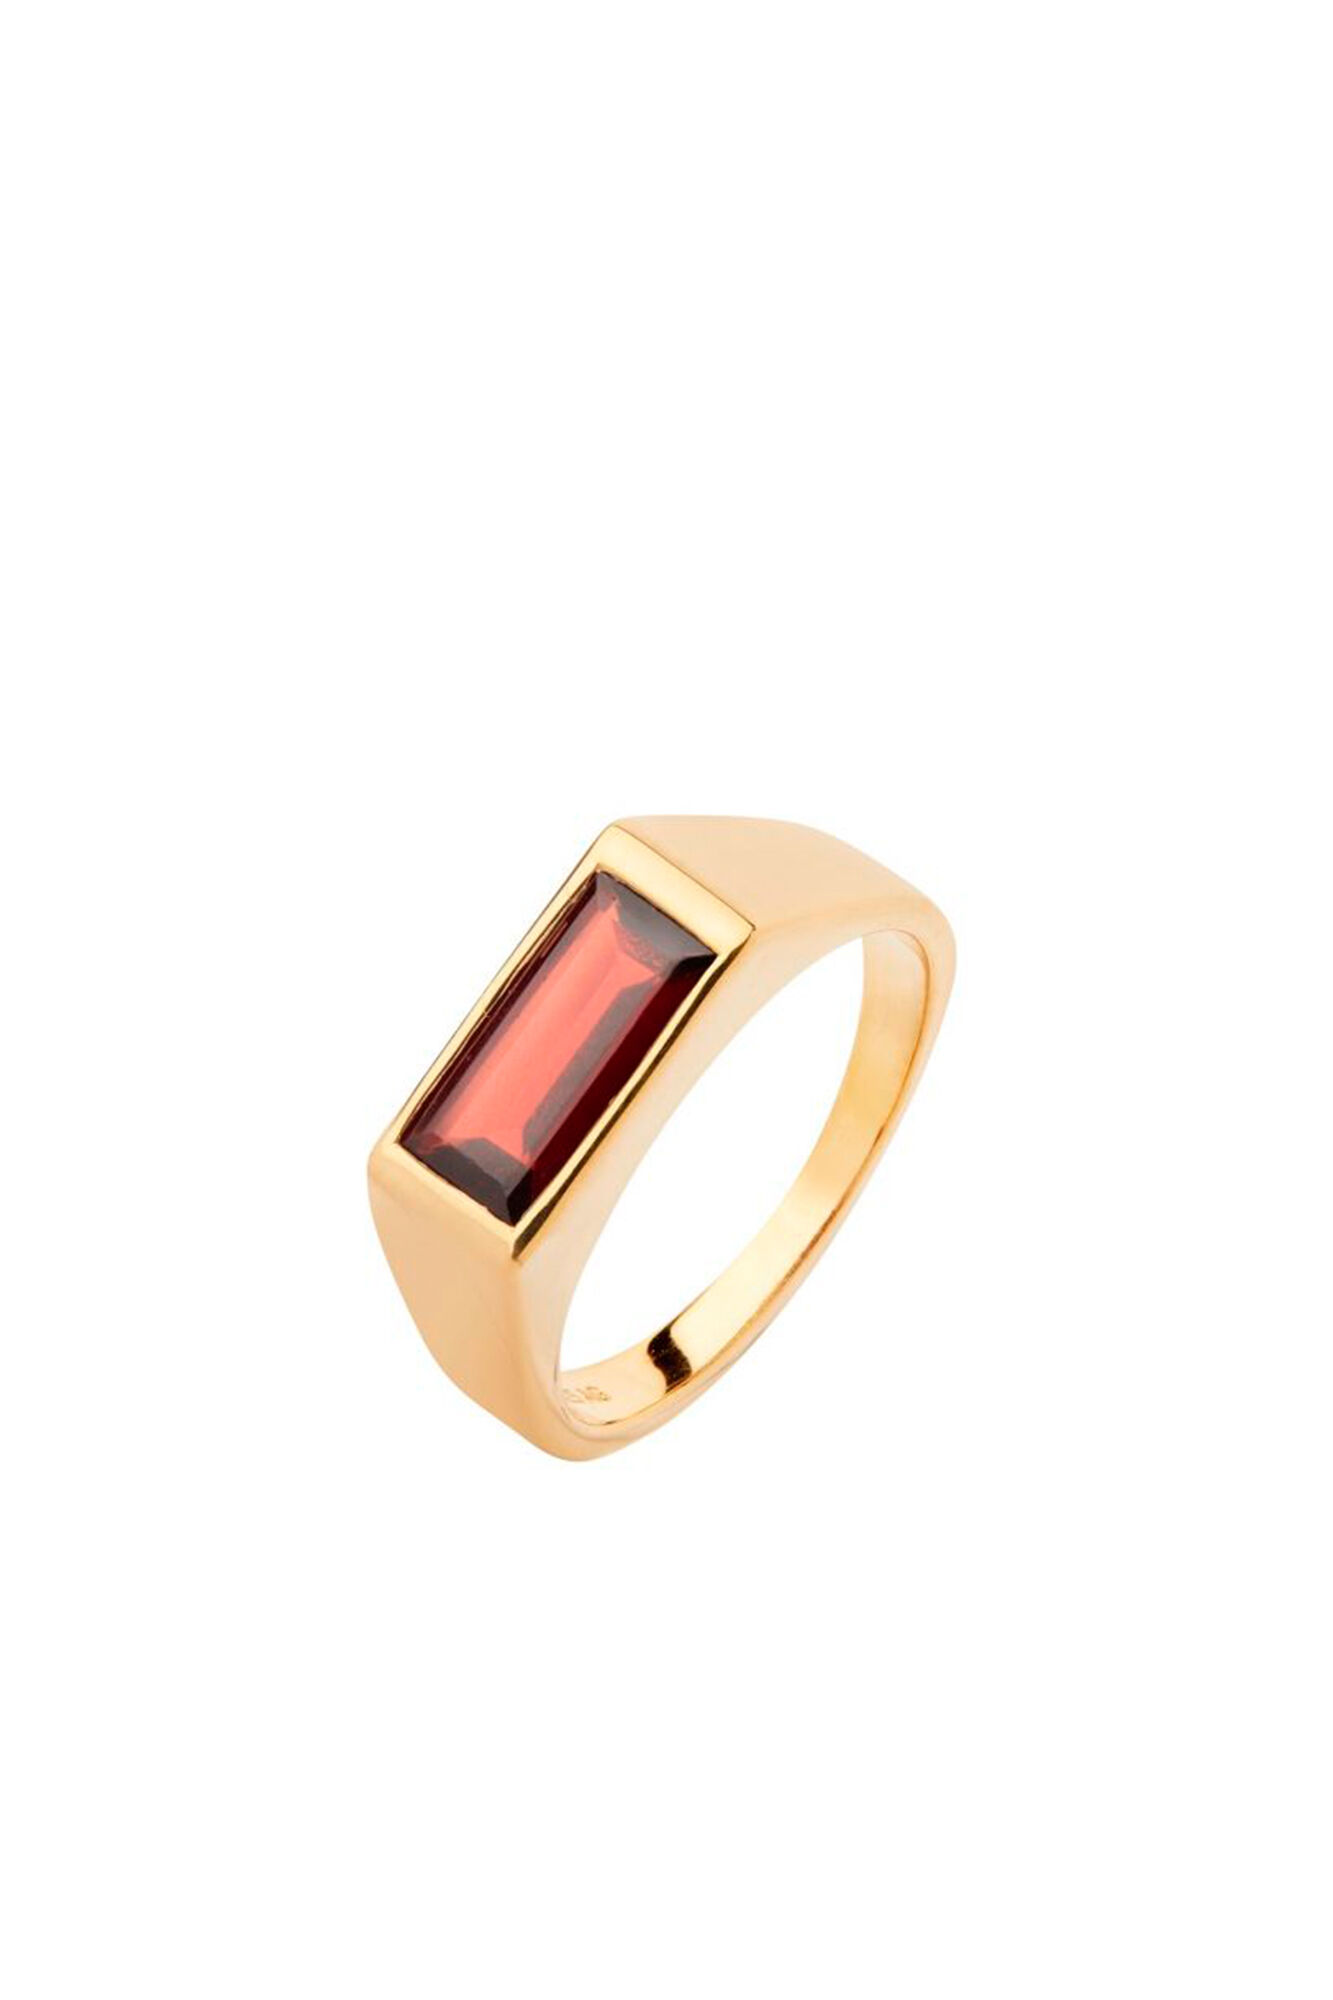 Harald Ring 500359, GOLD HP